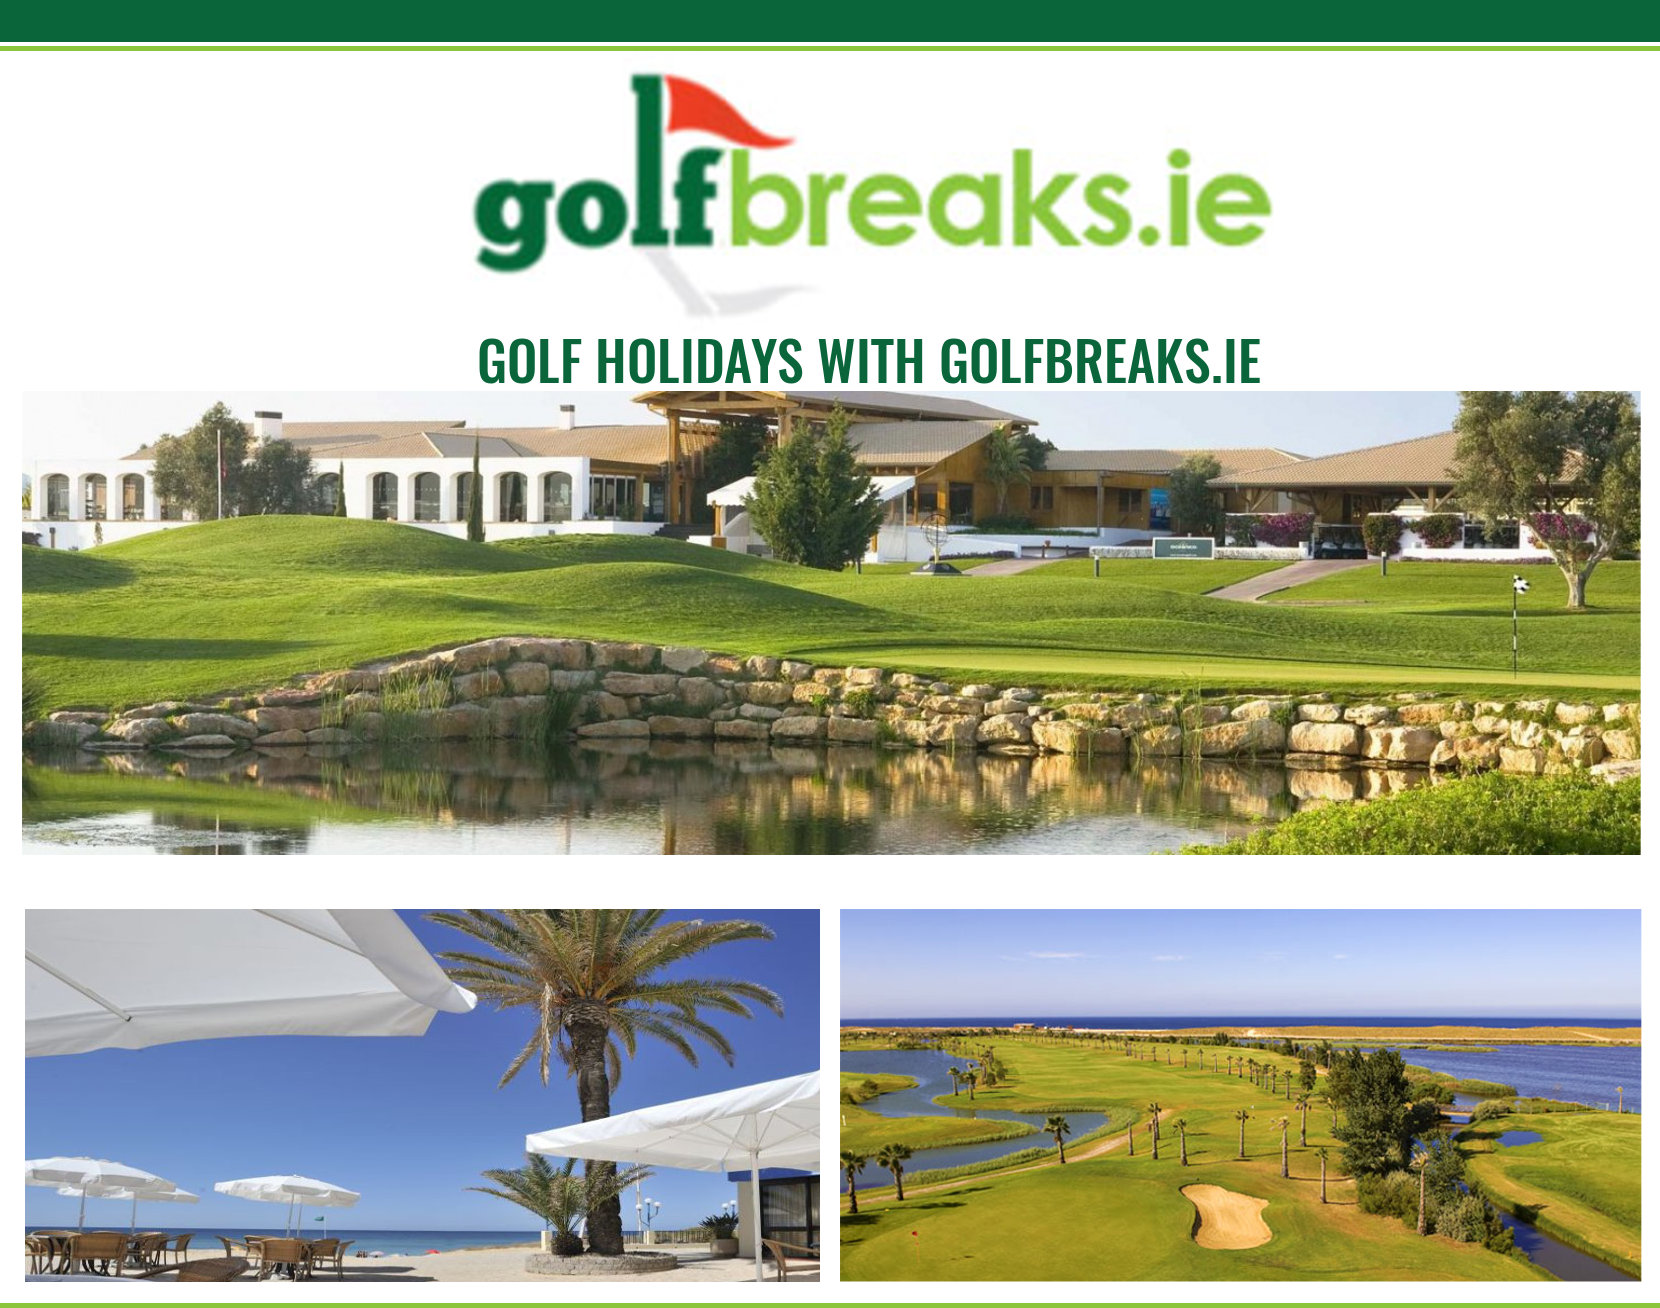 GolfBreaks.ie